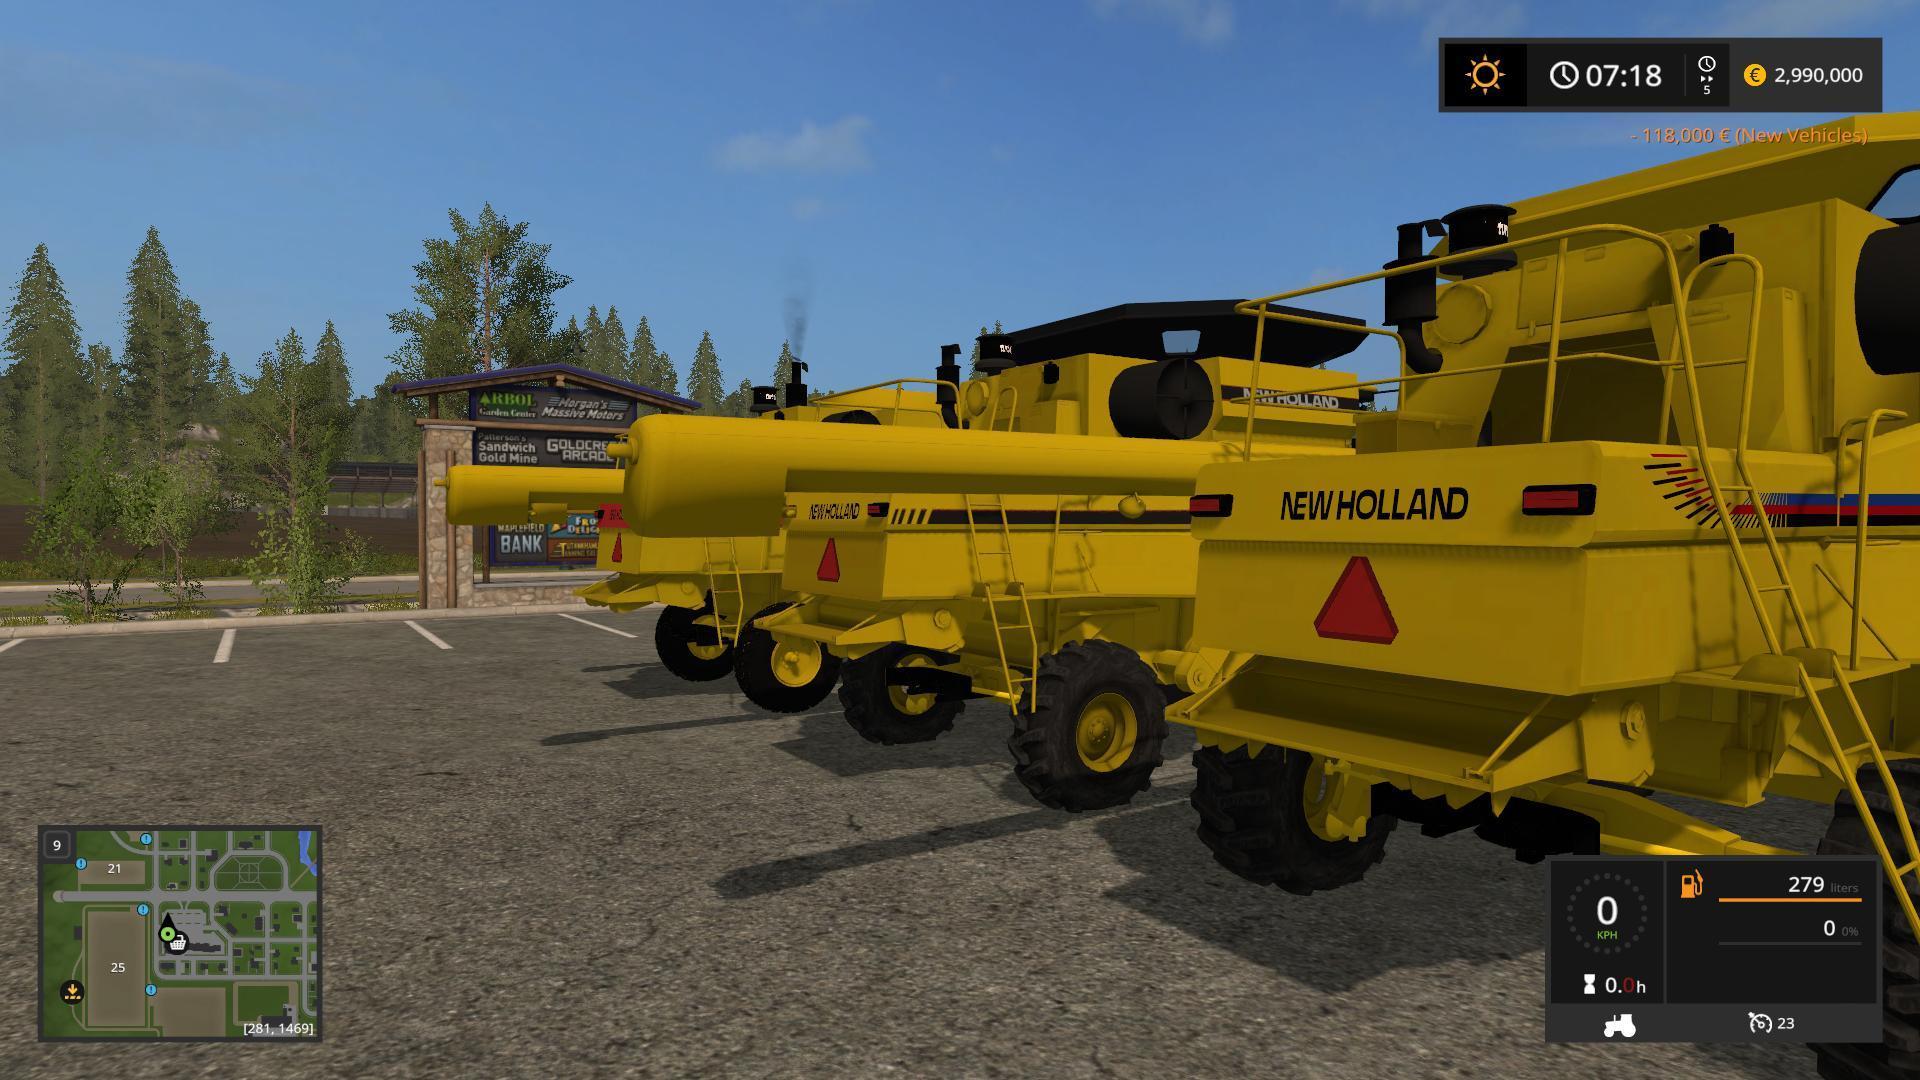 3 NEW HOLLAND TR HARVESTERS V1.0 FS17 - Farming Simulator 17 mod / FS 2017 mod